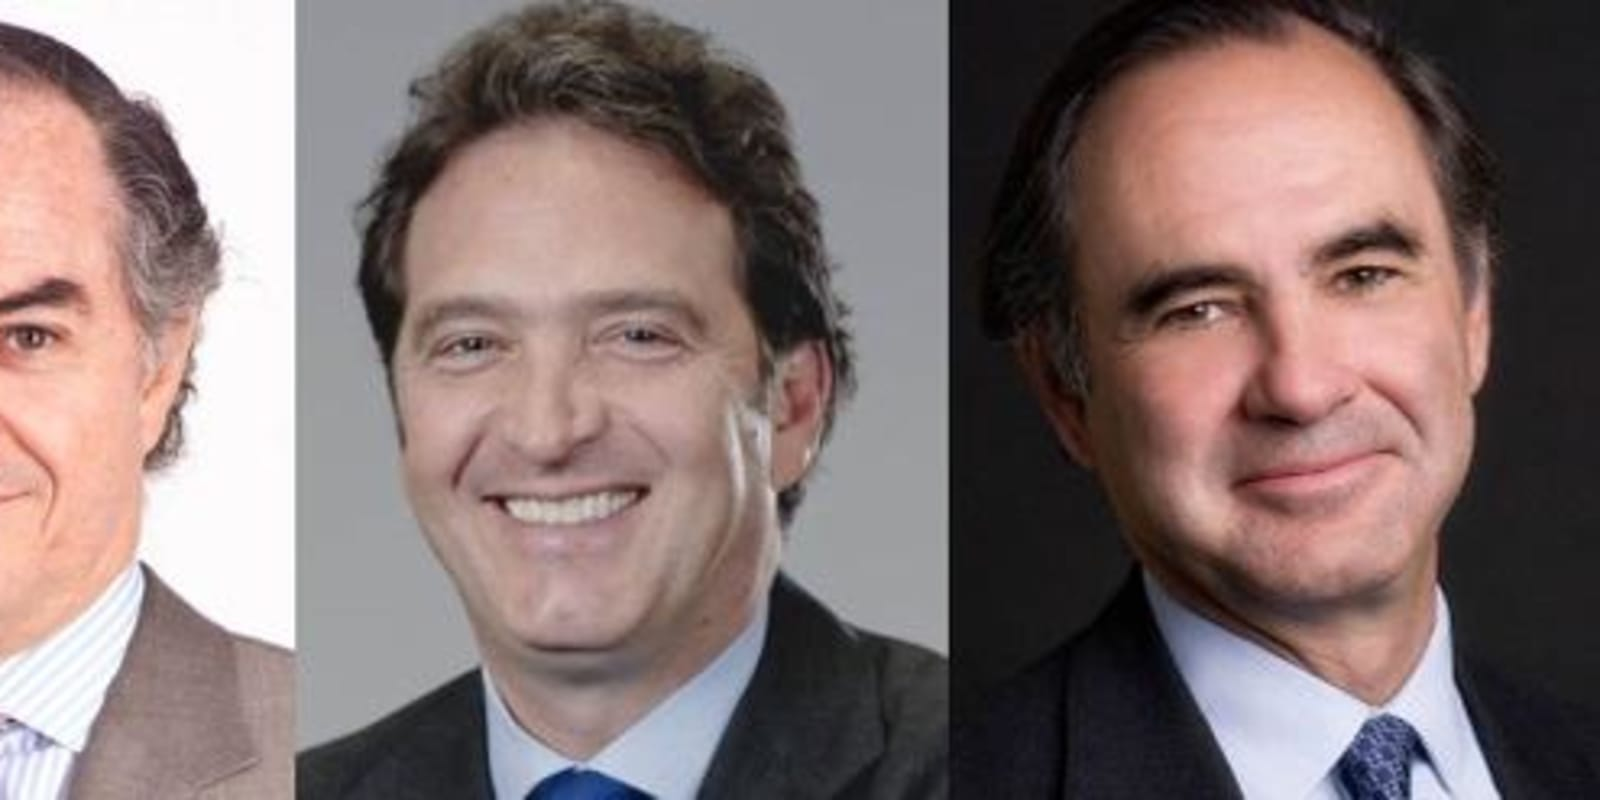 Philippi And Prietocarrizosa To Merge With Uria Backing Latin Lawyer